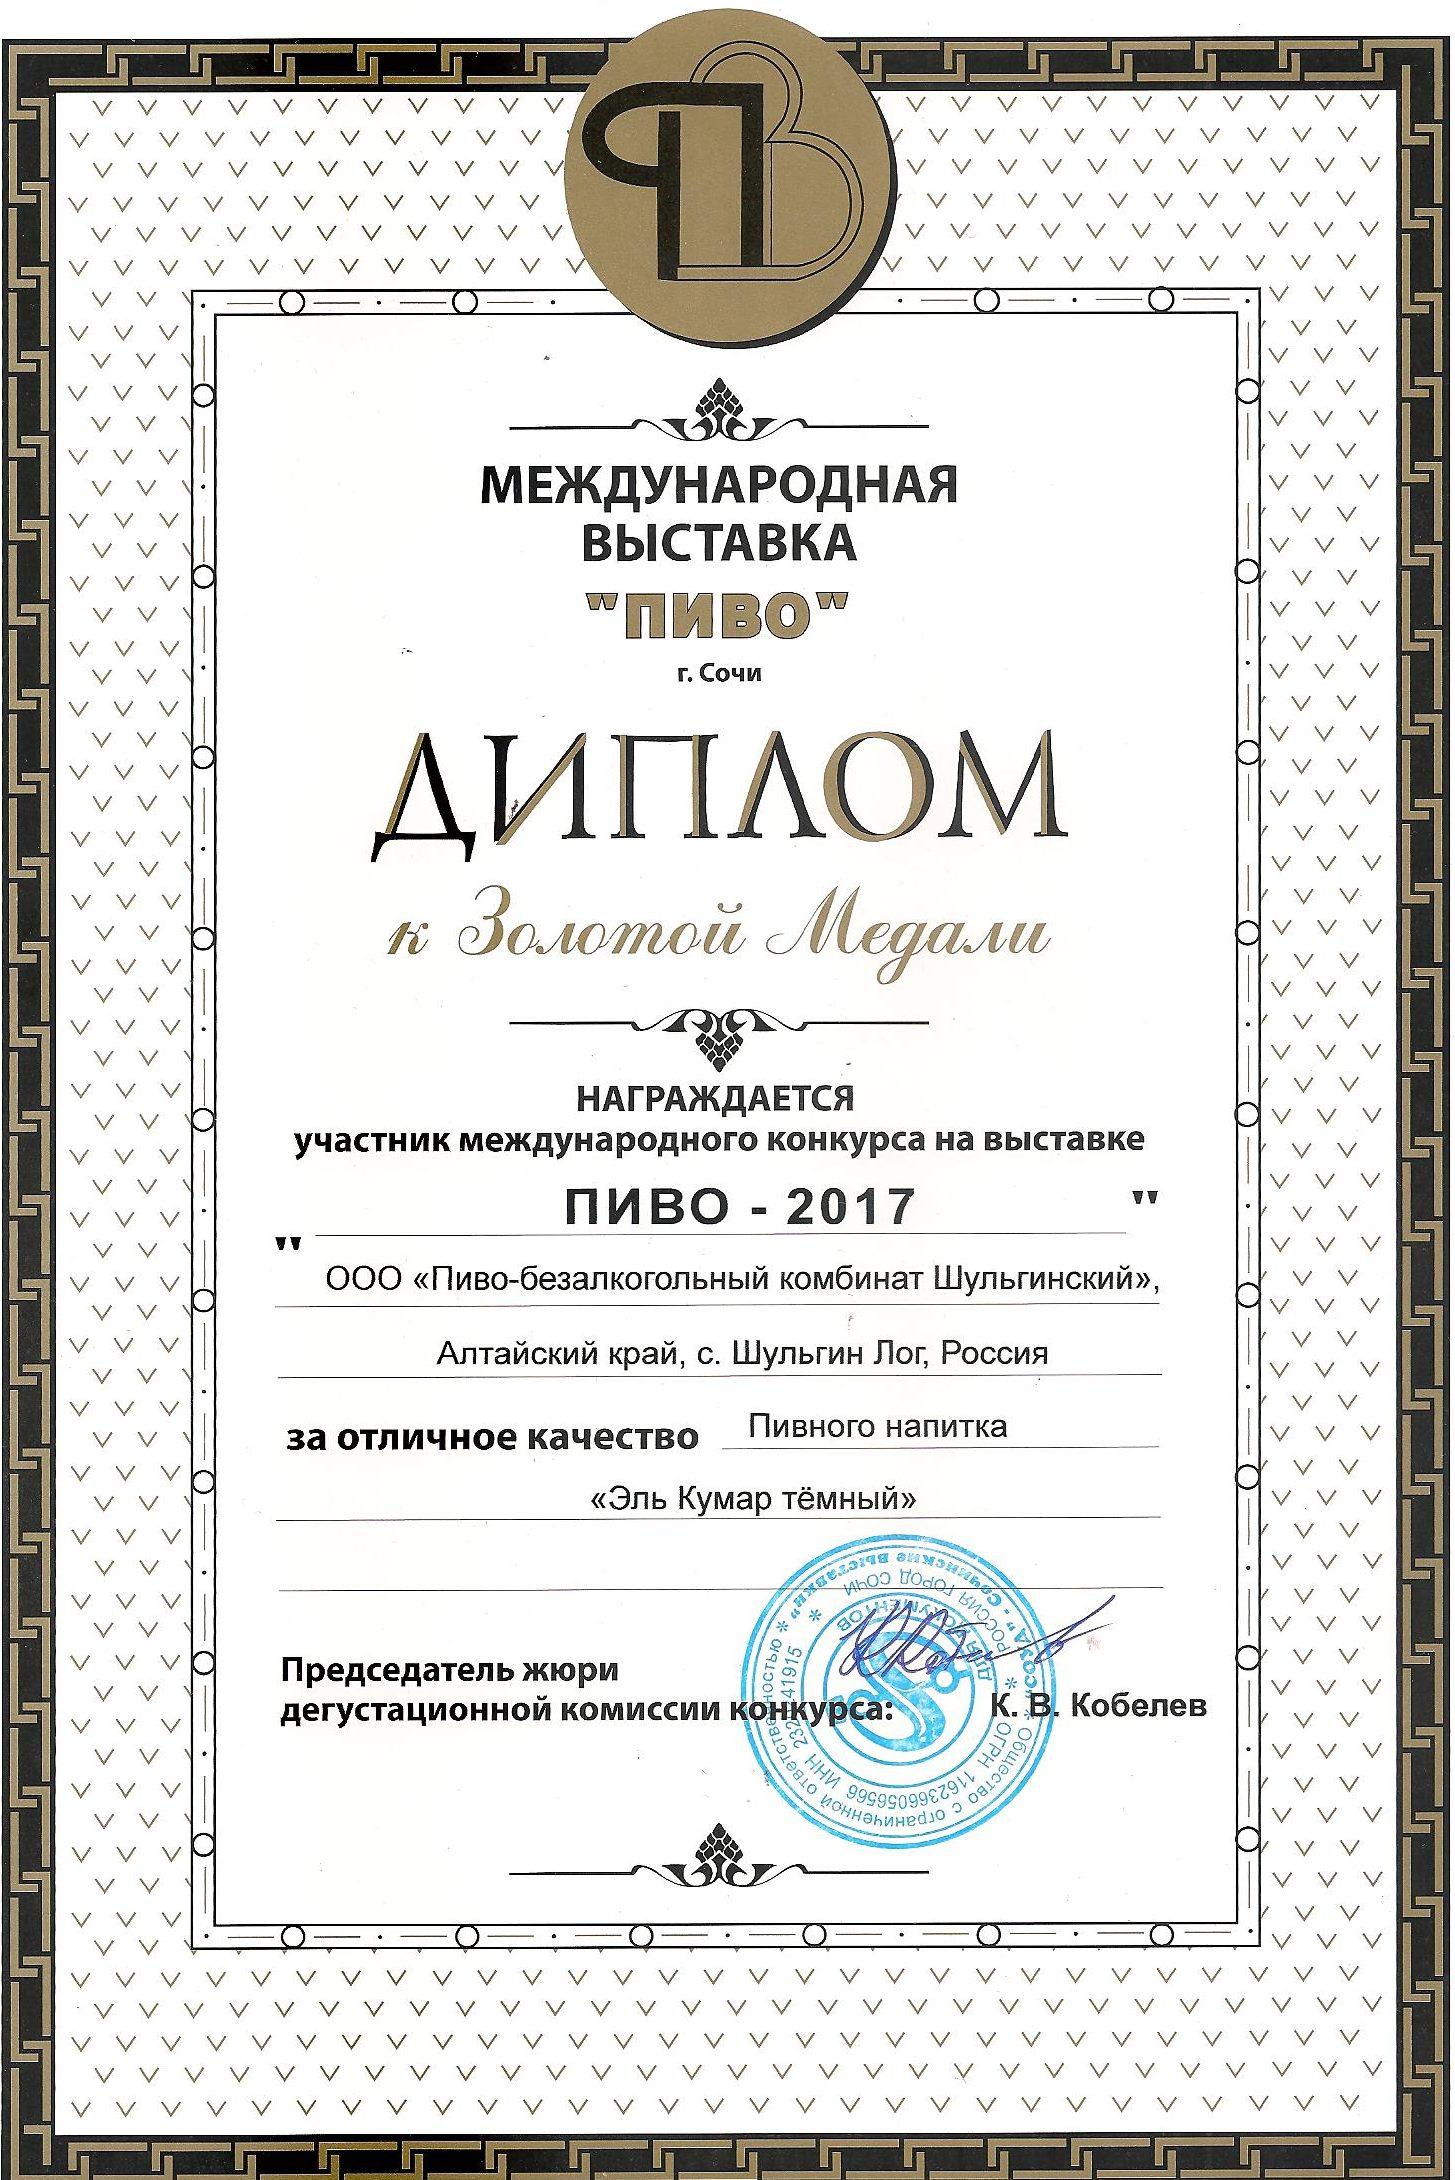 ЭльКумарТем-Золото